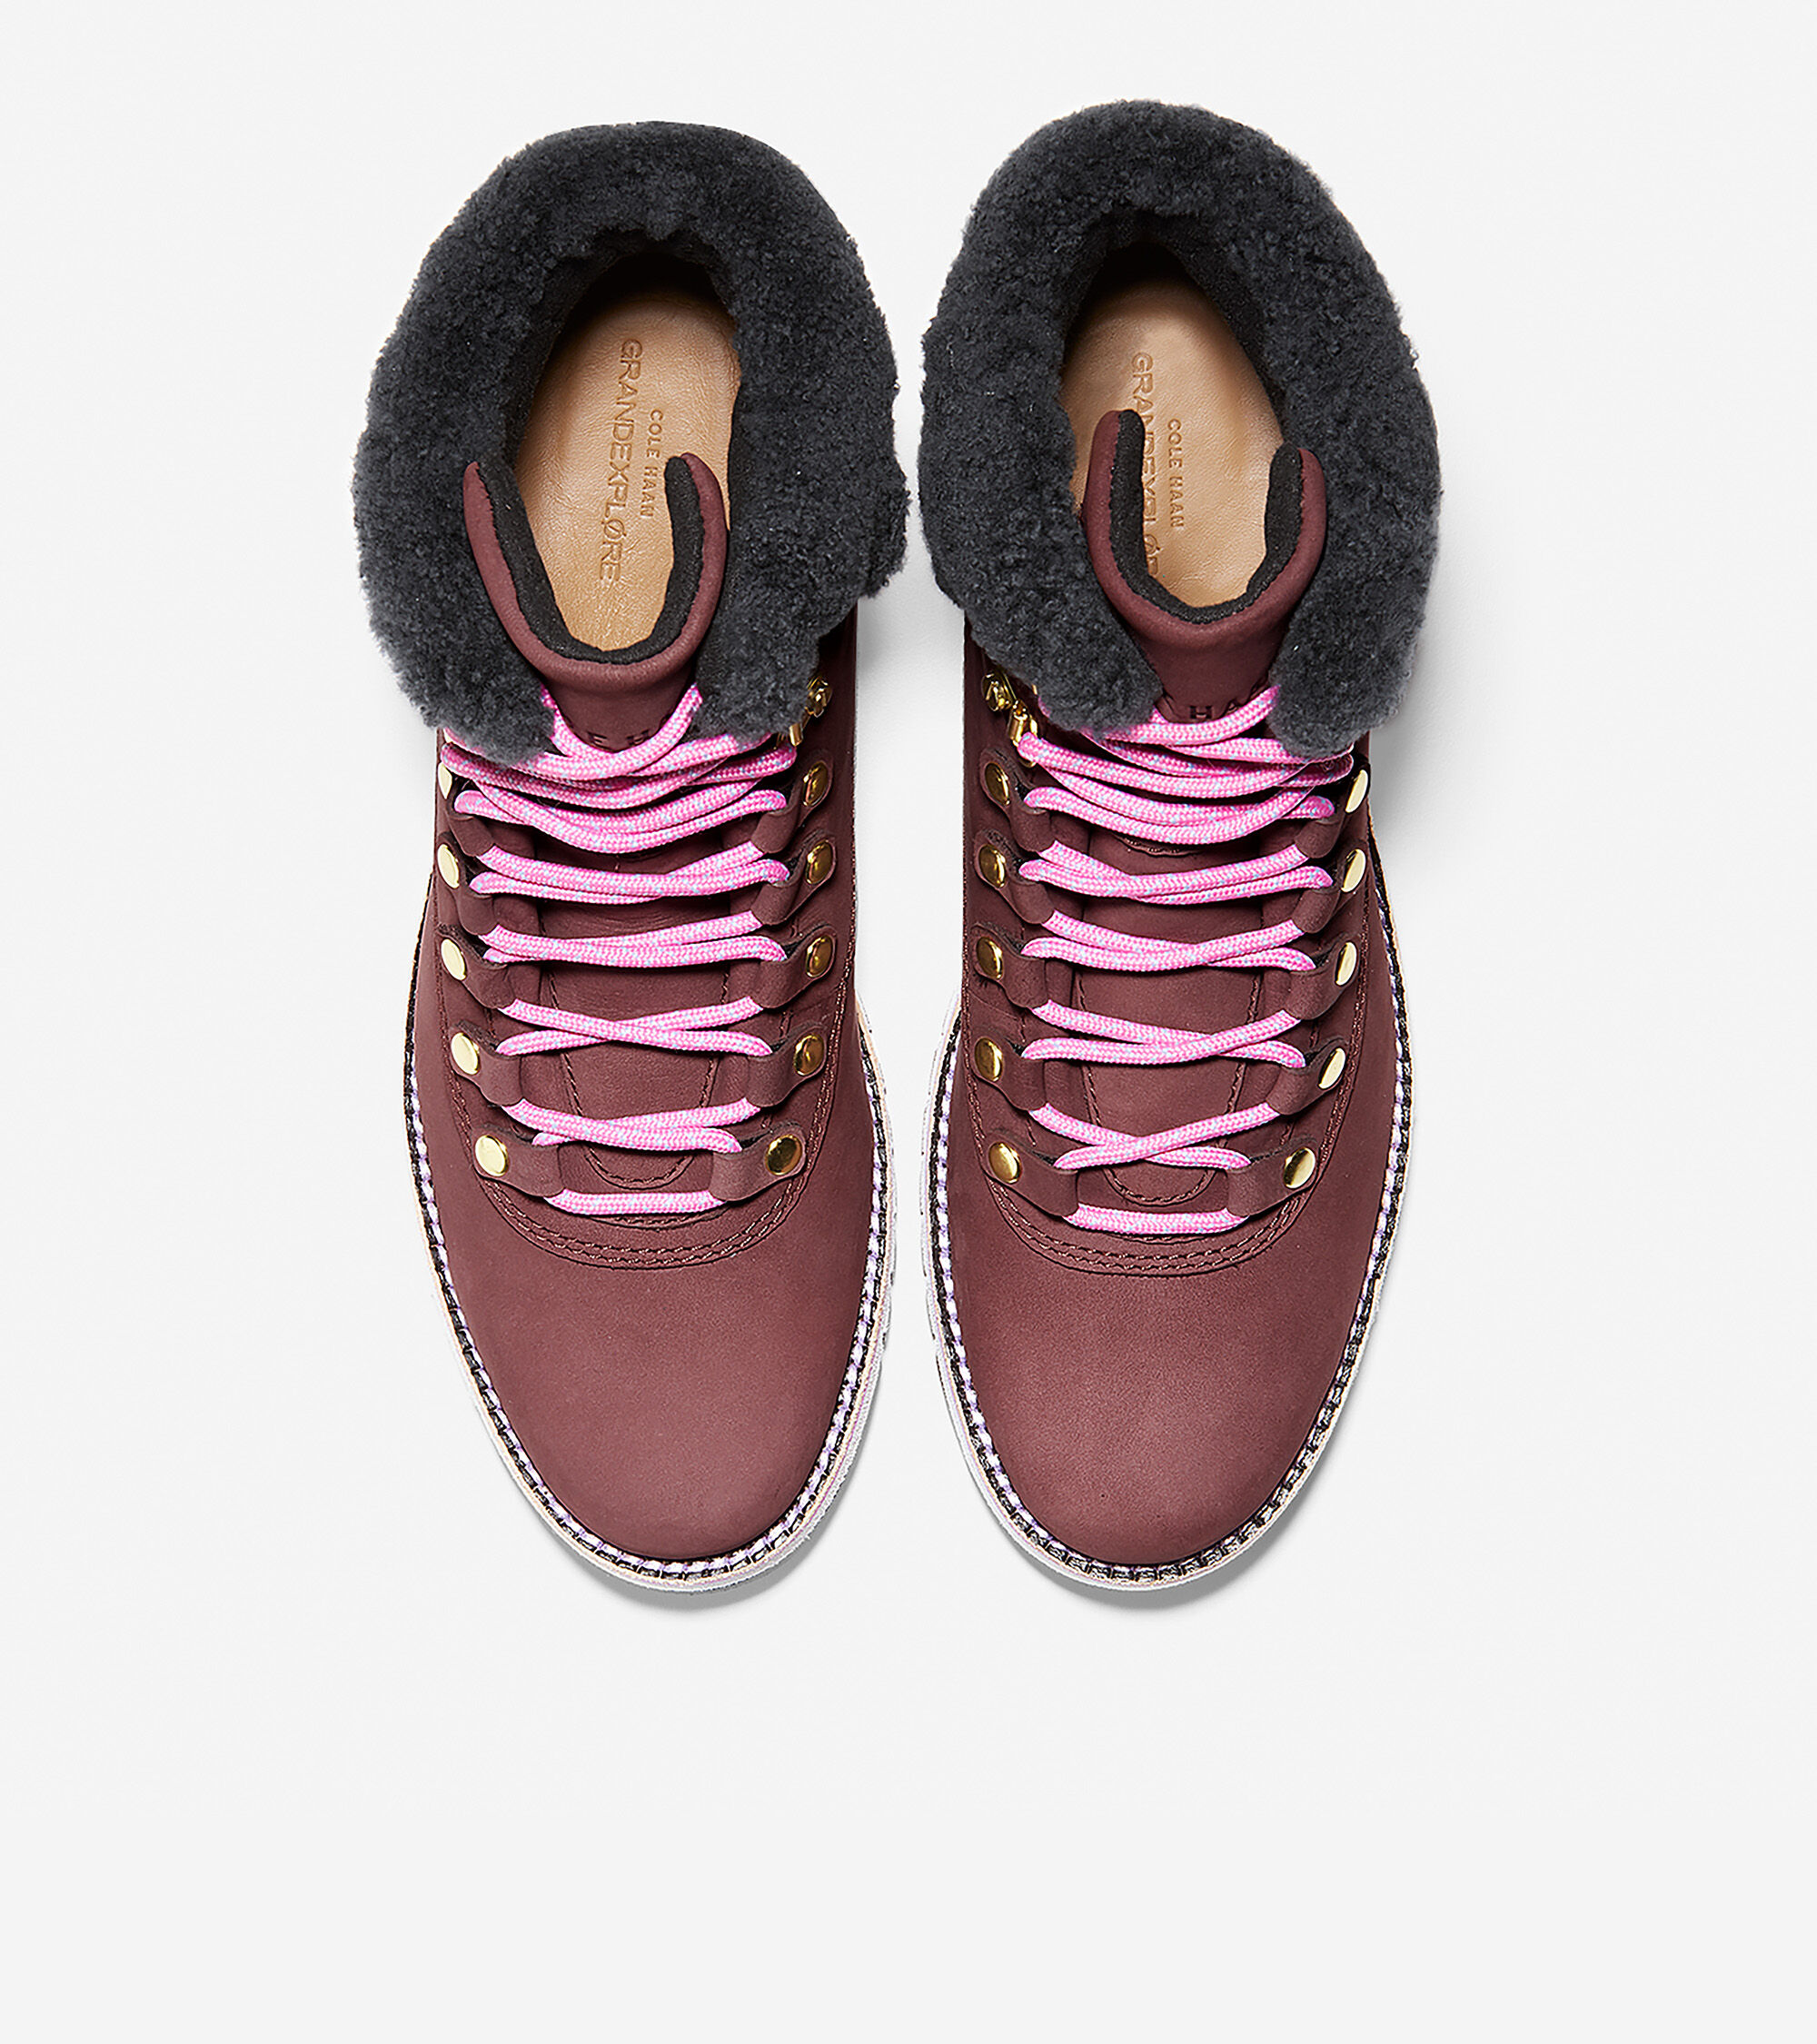 fe9bef0dbea Women's ZEROGRAND All-Terrain Waterproof Hiker Boots in Chocolate ...